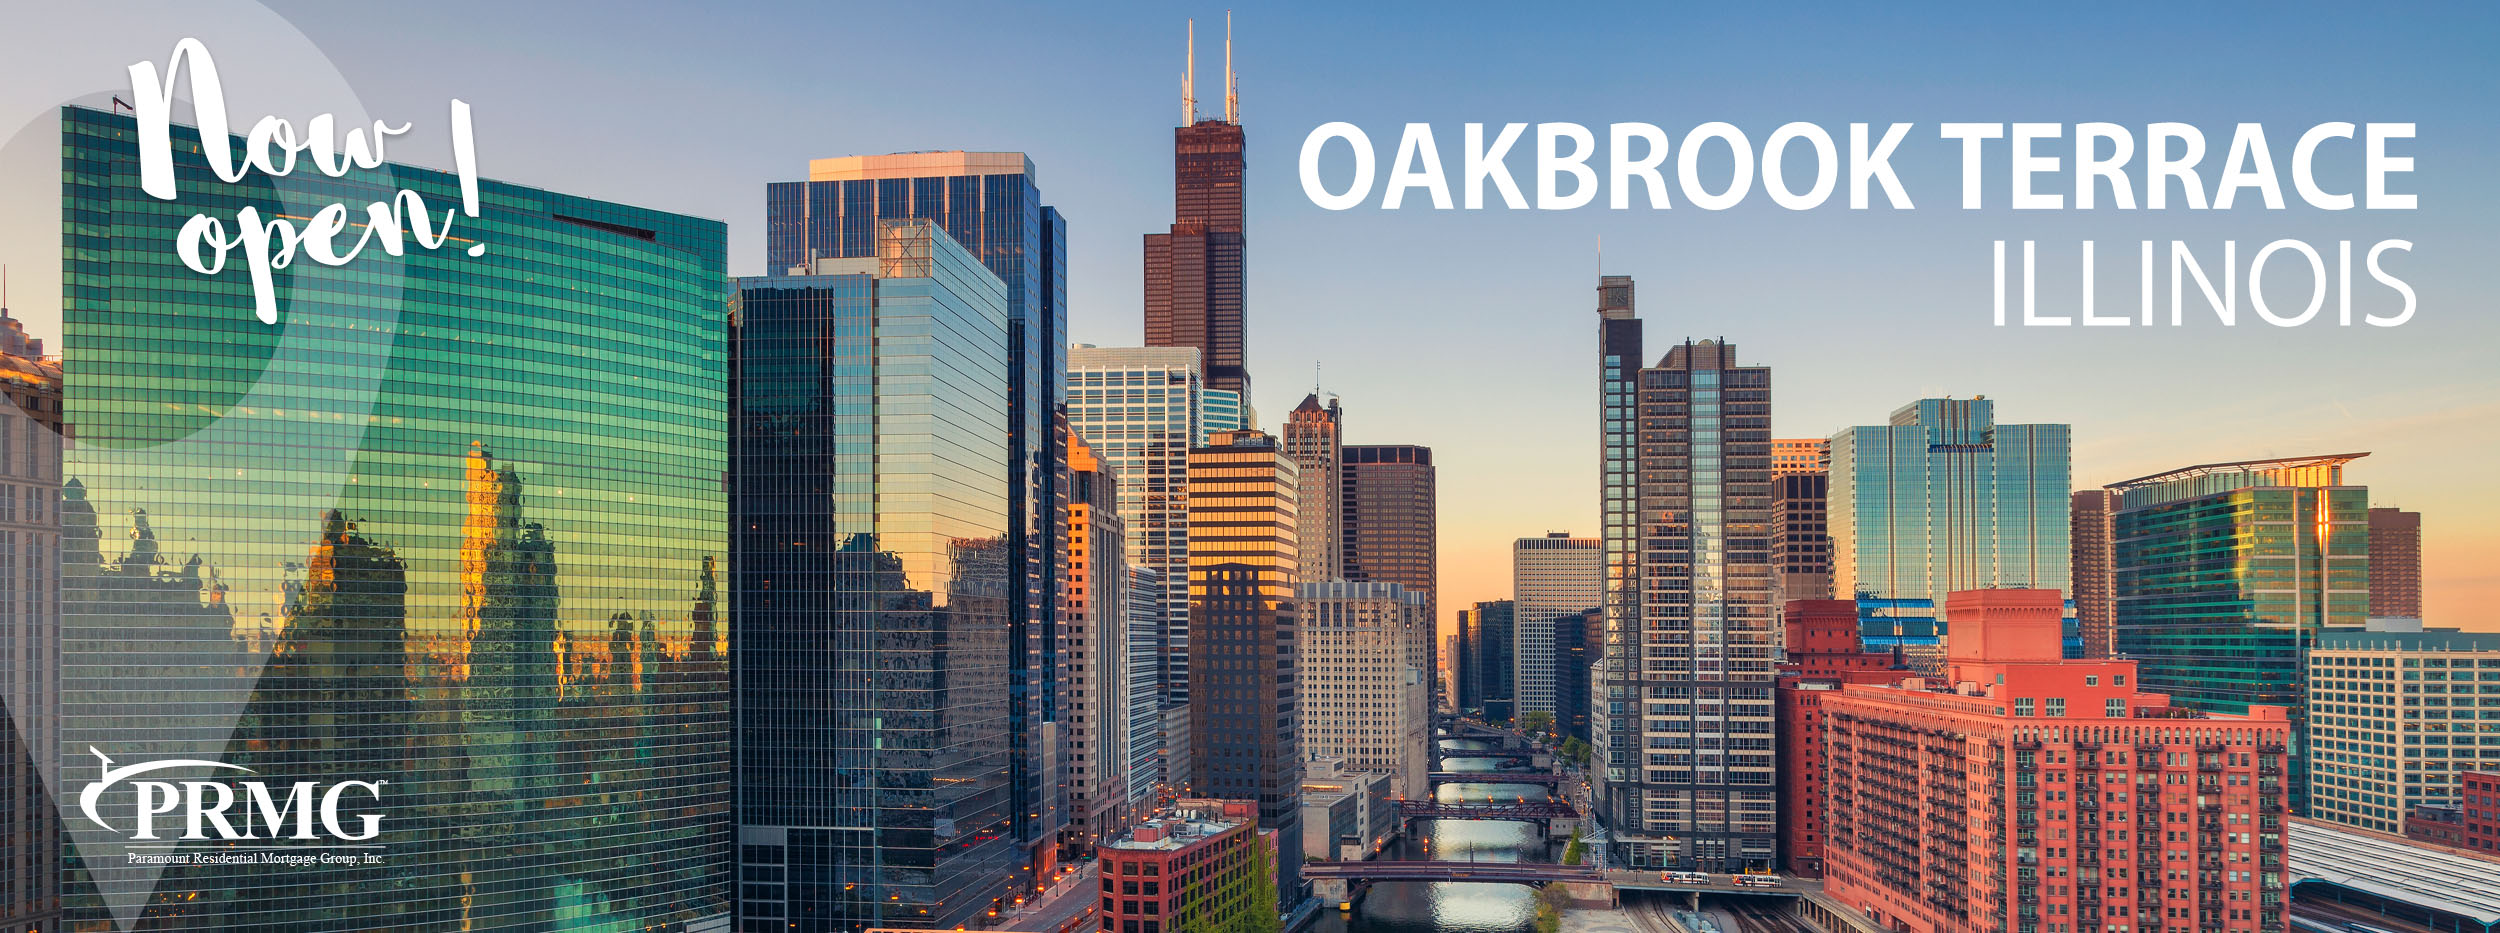 Oakbrook Terrace, IL - Header.jpg